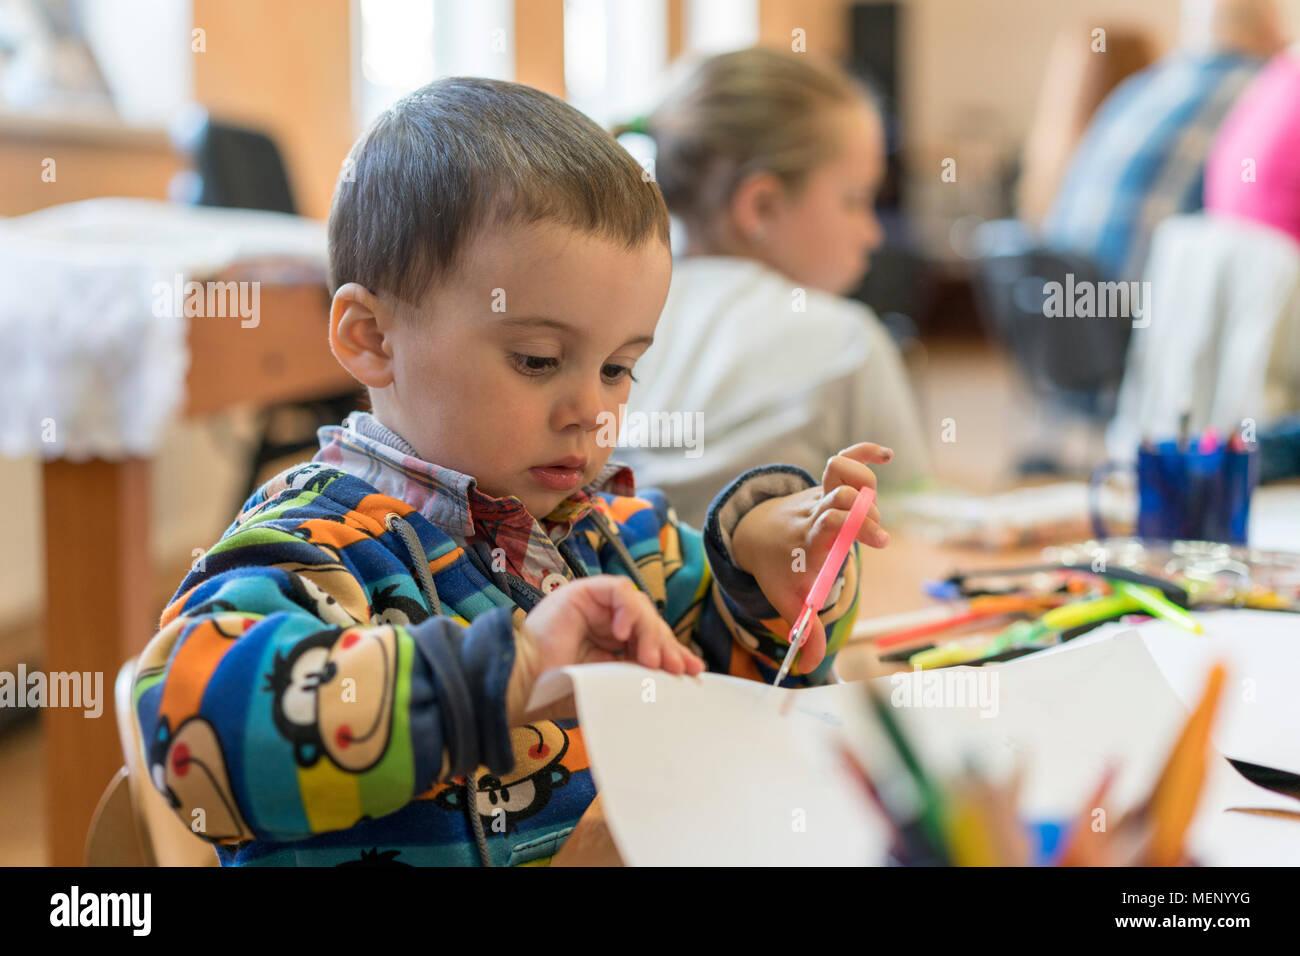 boy cutting drawing scissors stock photos amp boy cutting